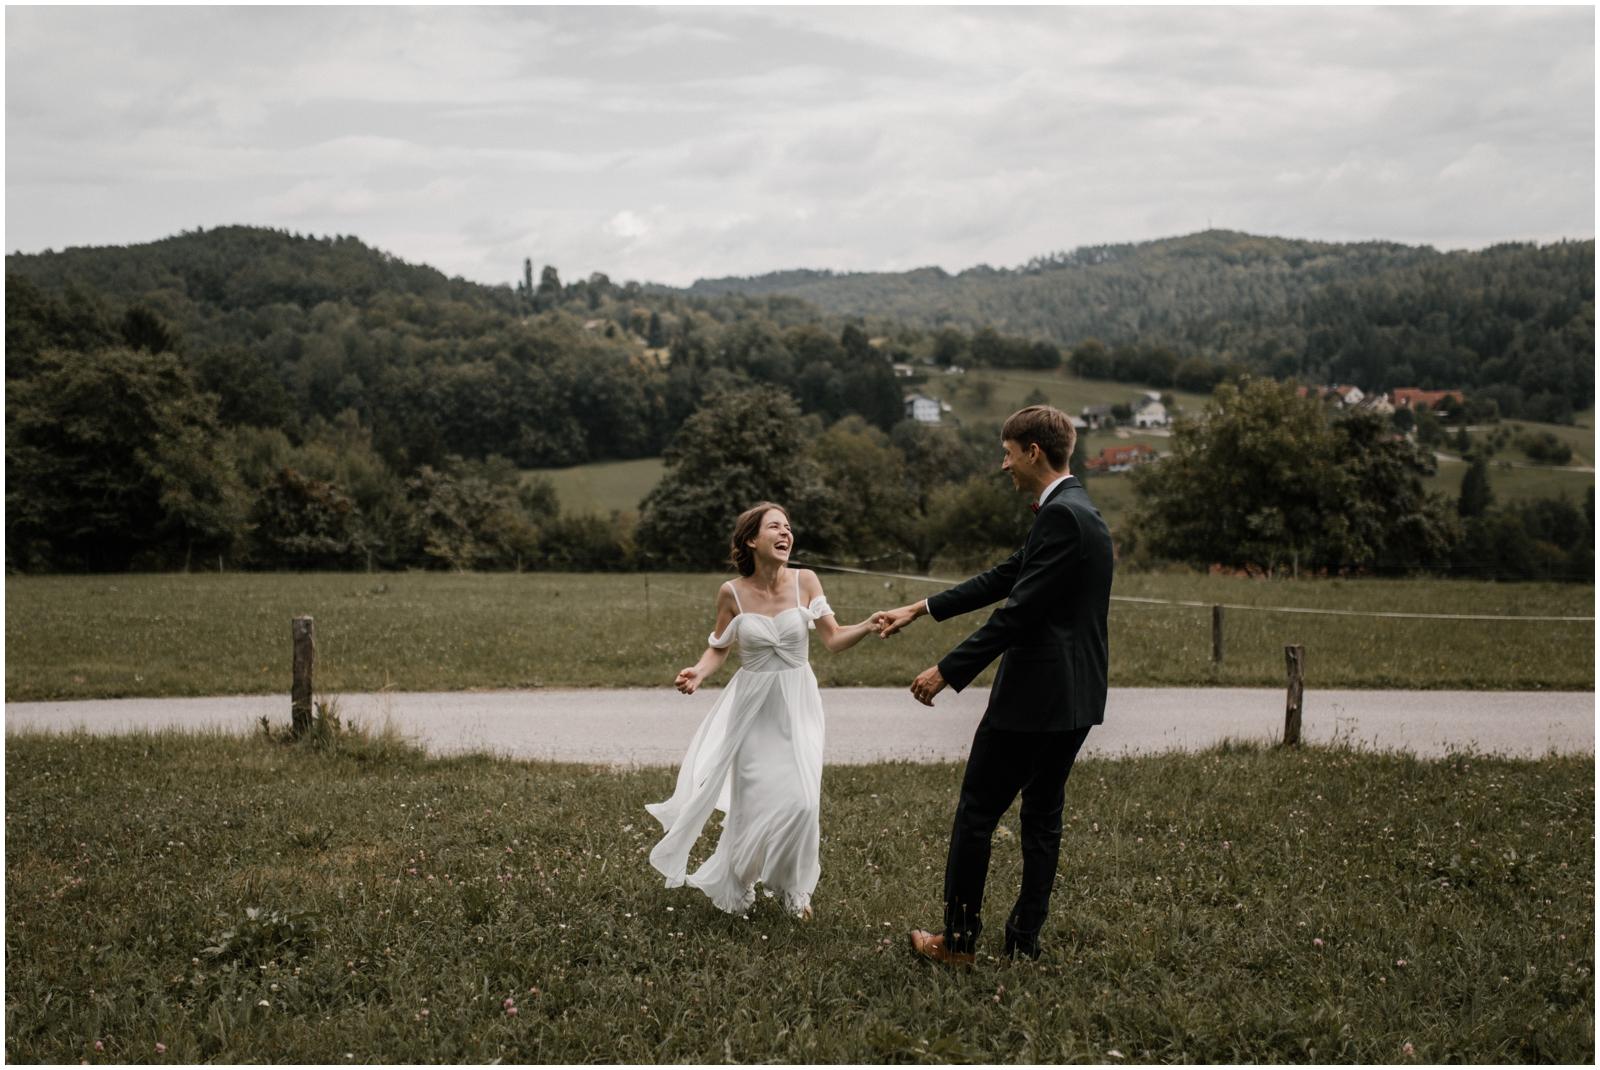 mirjam_thomas_wedding-200.jpg